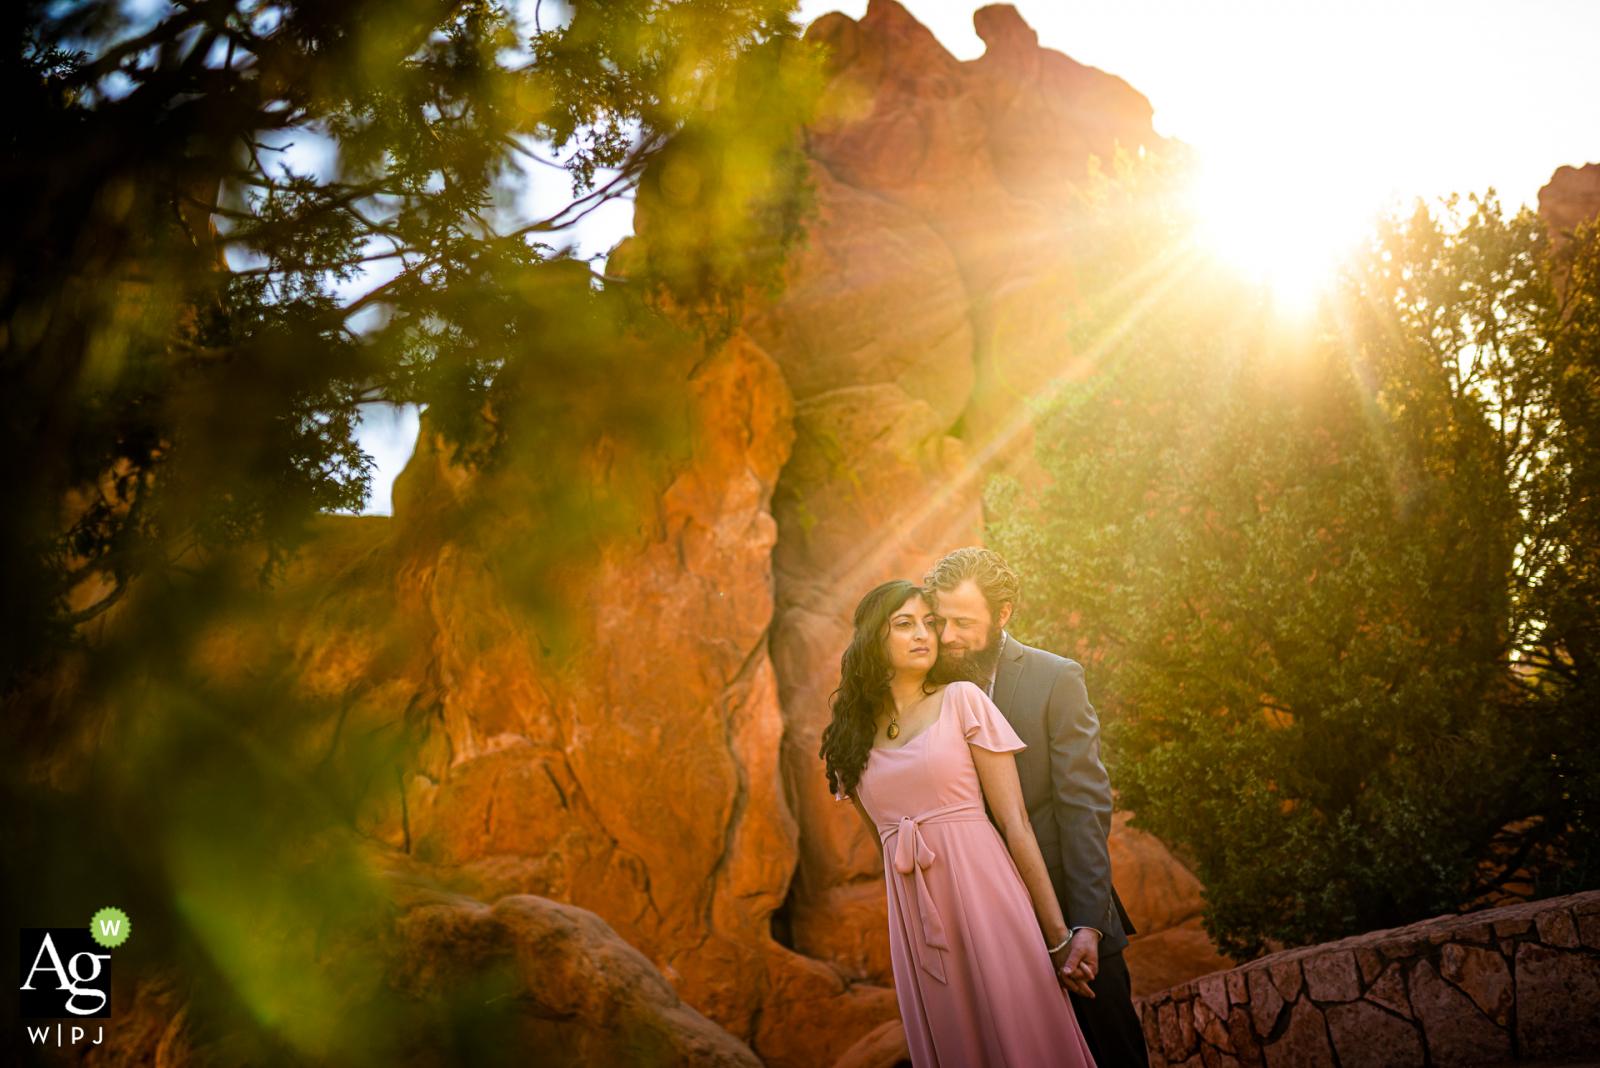 Garden of the Gods Club & Resort, Colorado Springs, Colorado wedding couple posed portrait session after their sunrise wedding ceremony